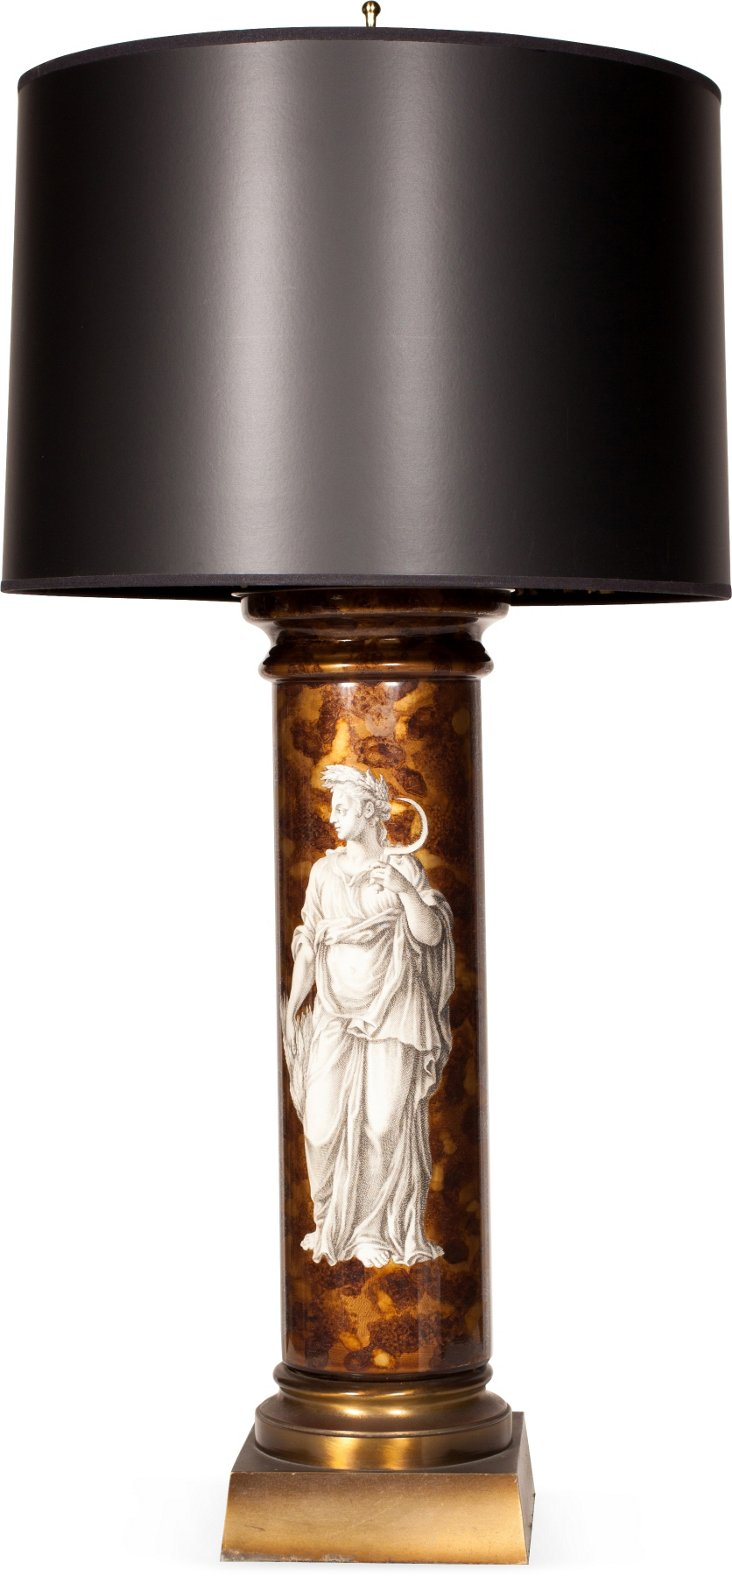 1960s Fornasetti-Style Lamp I